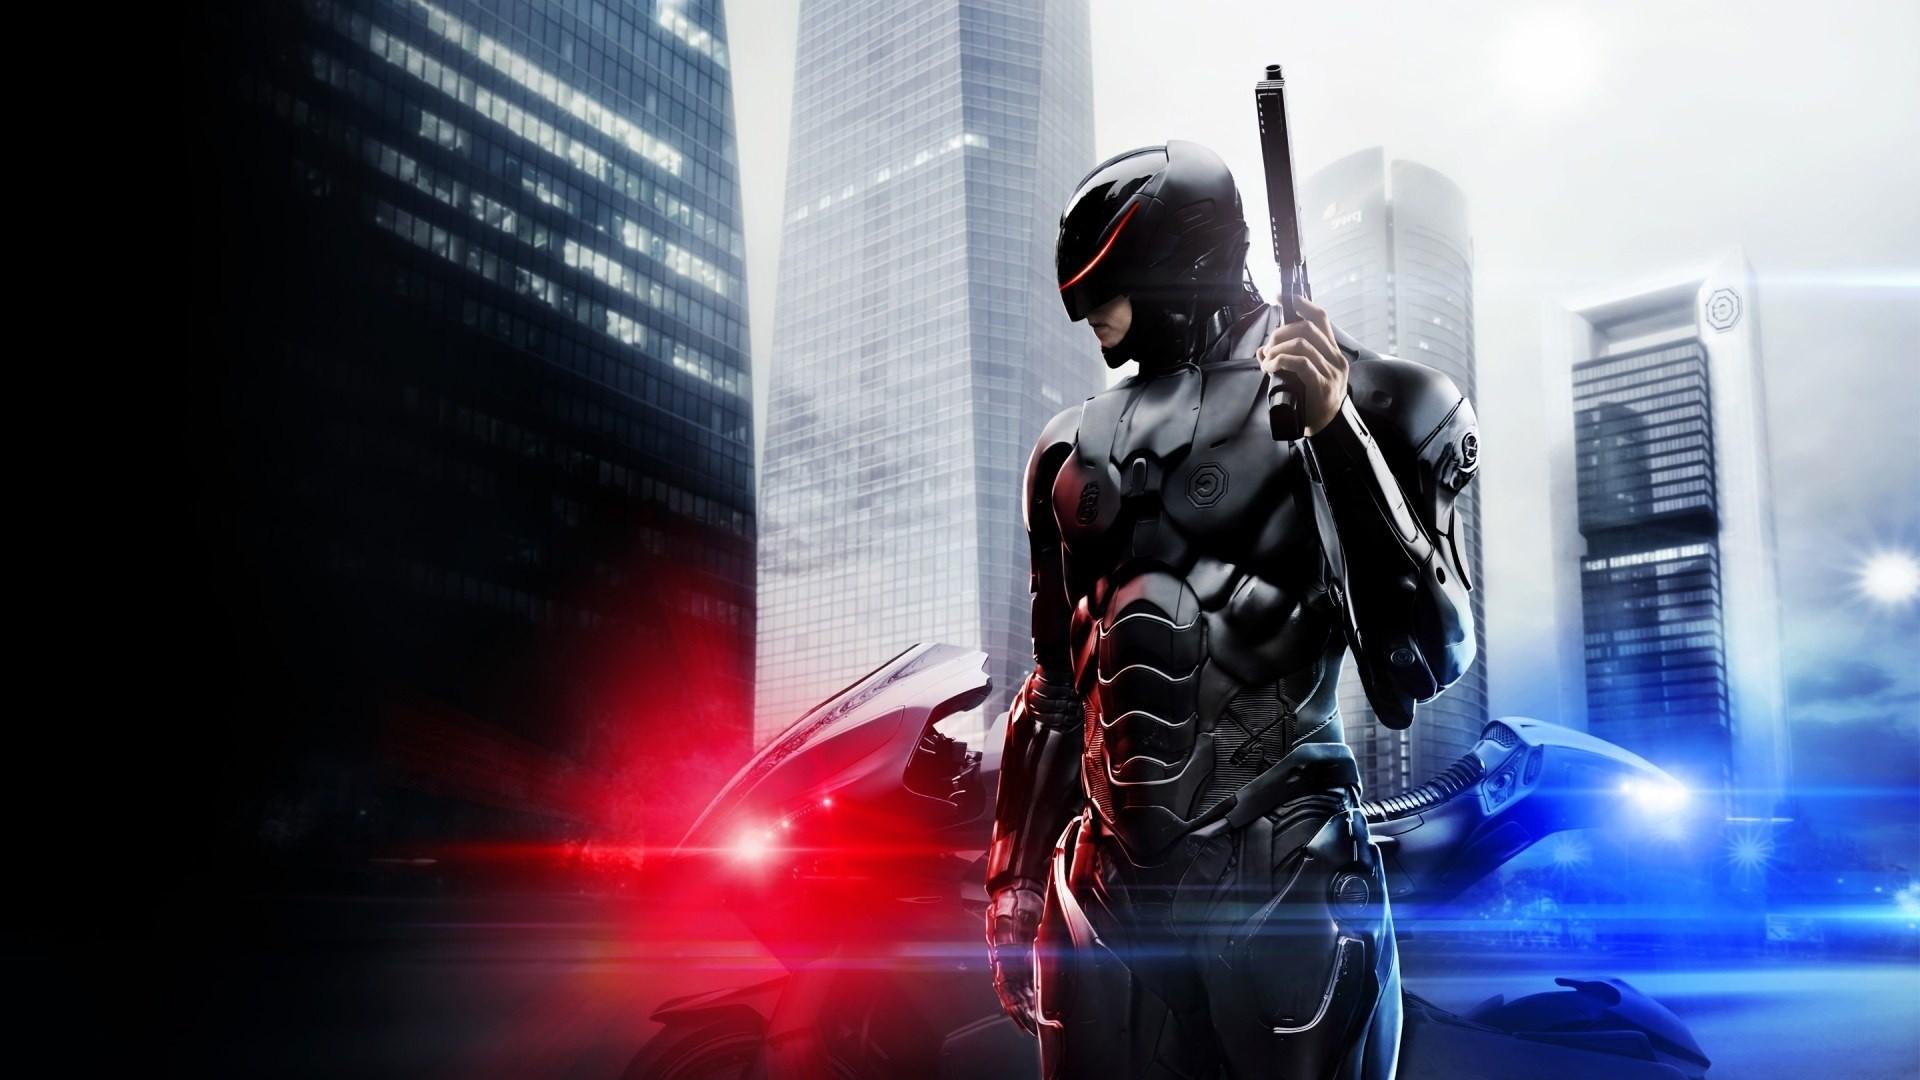 Download Wallpaper Robocop, Robo, Cop, Film, Movie, 2014 .